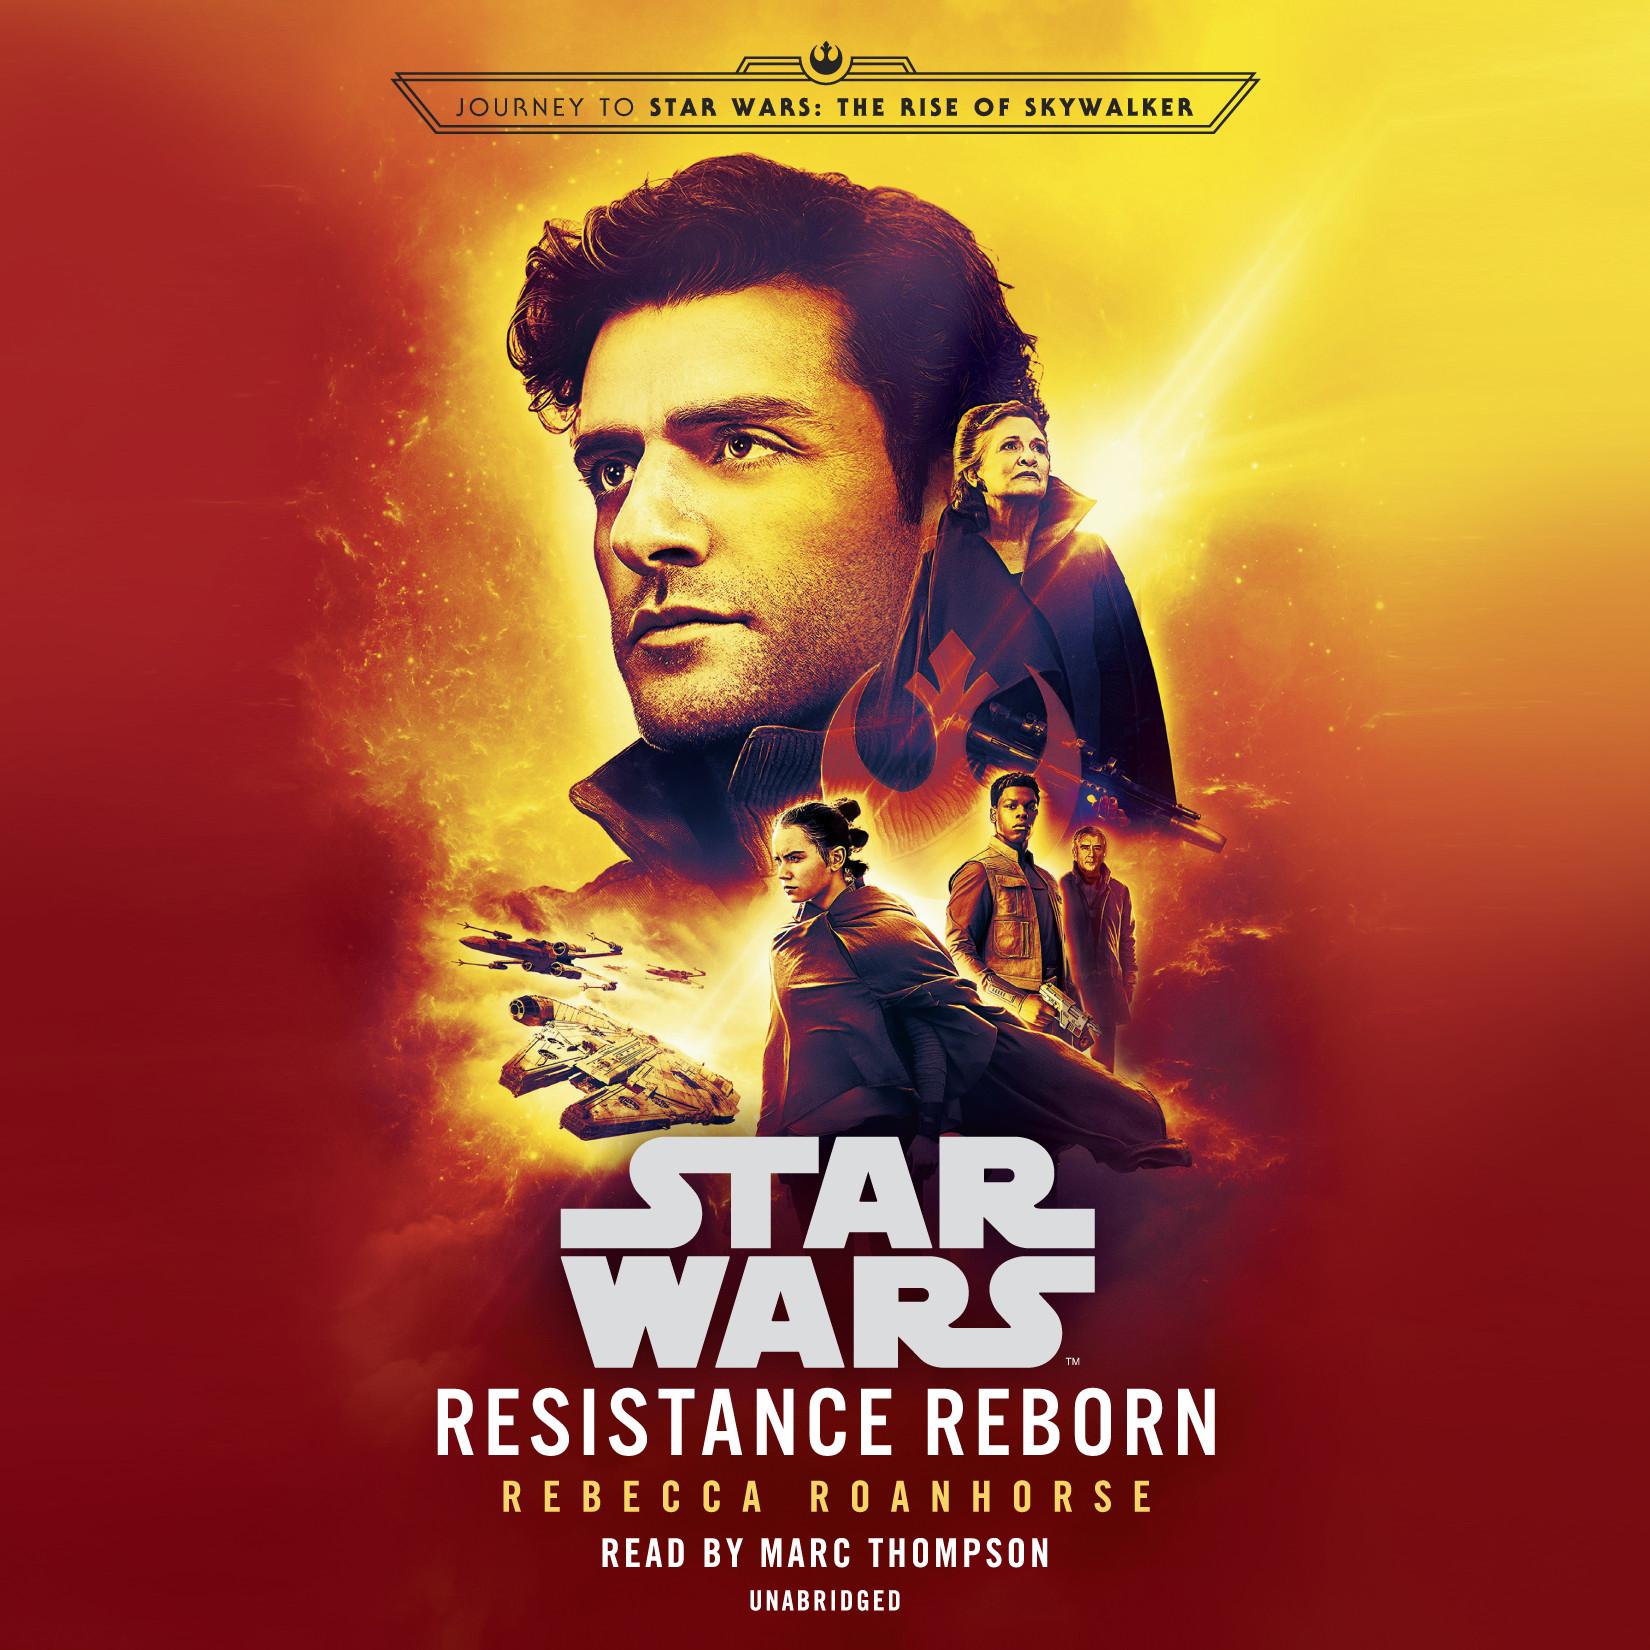 Resistance Reborn Audiobook Cover.jpg